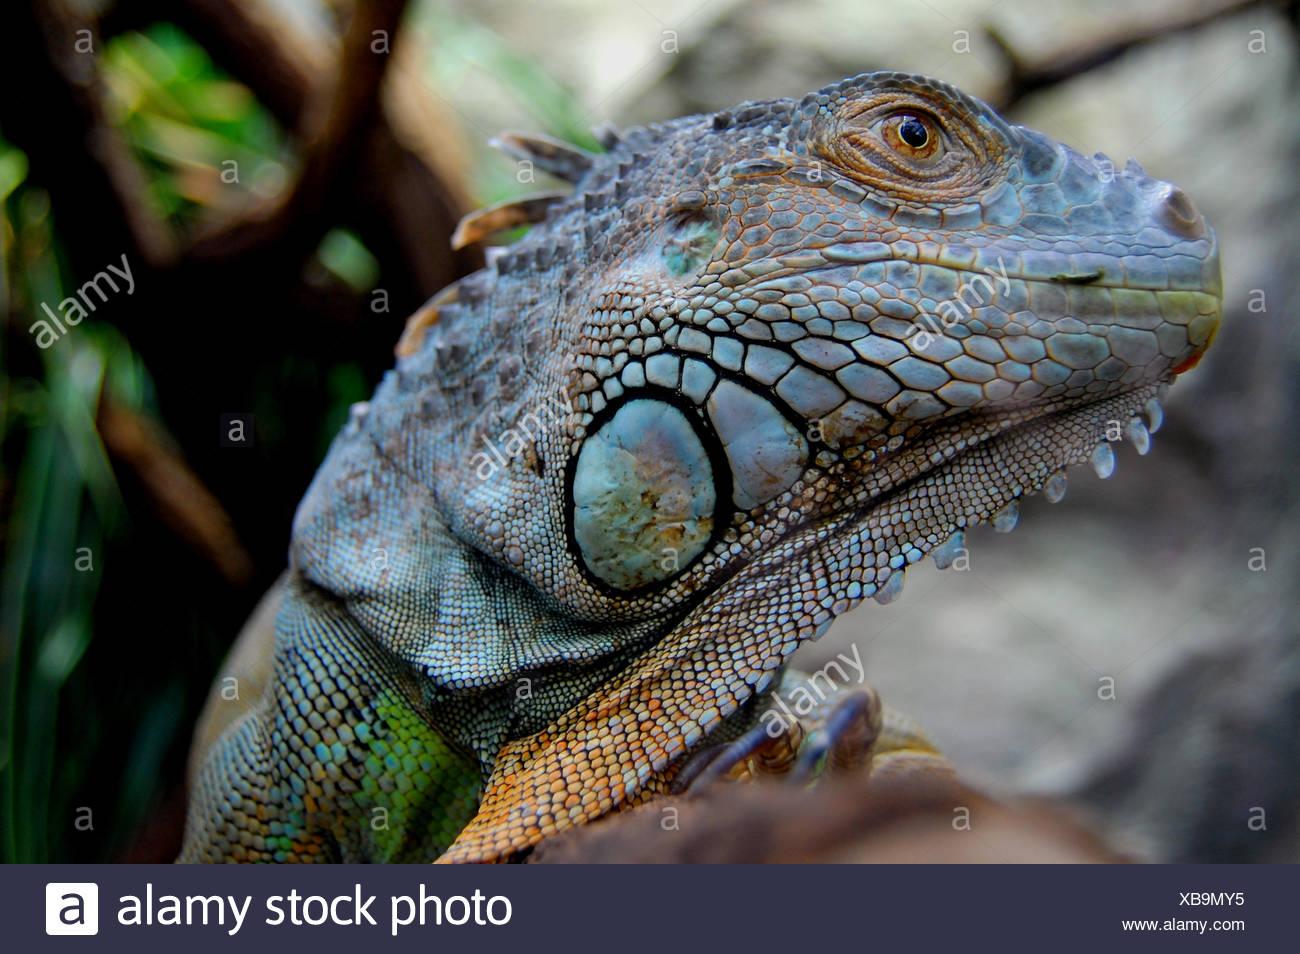 reptiles amphibians - Stock Image